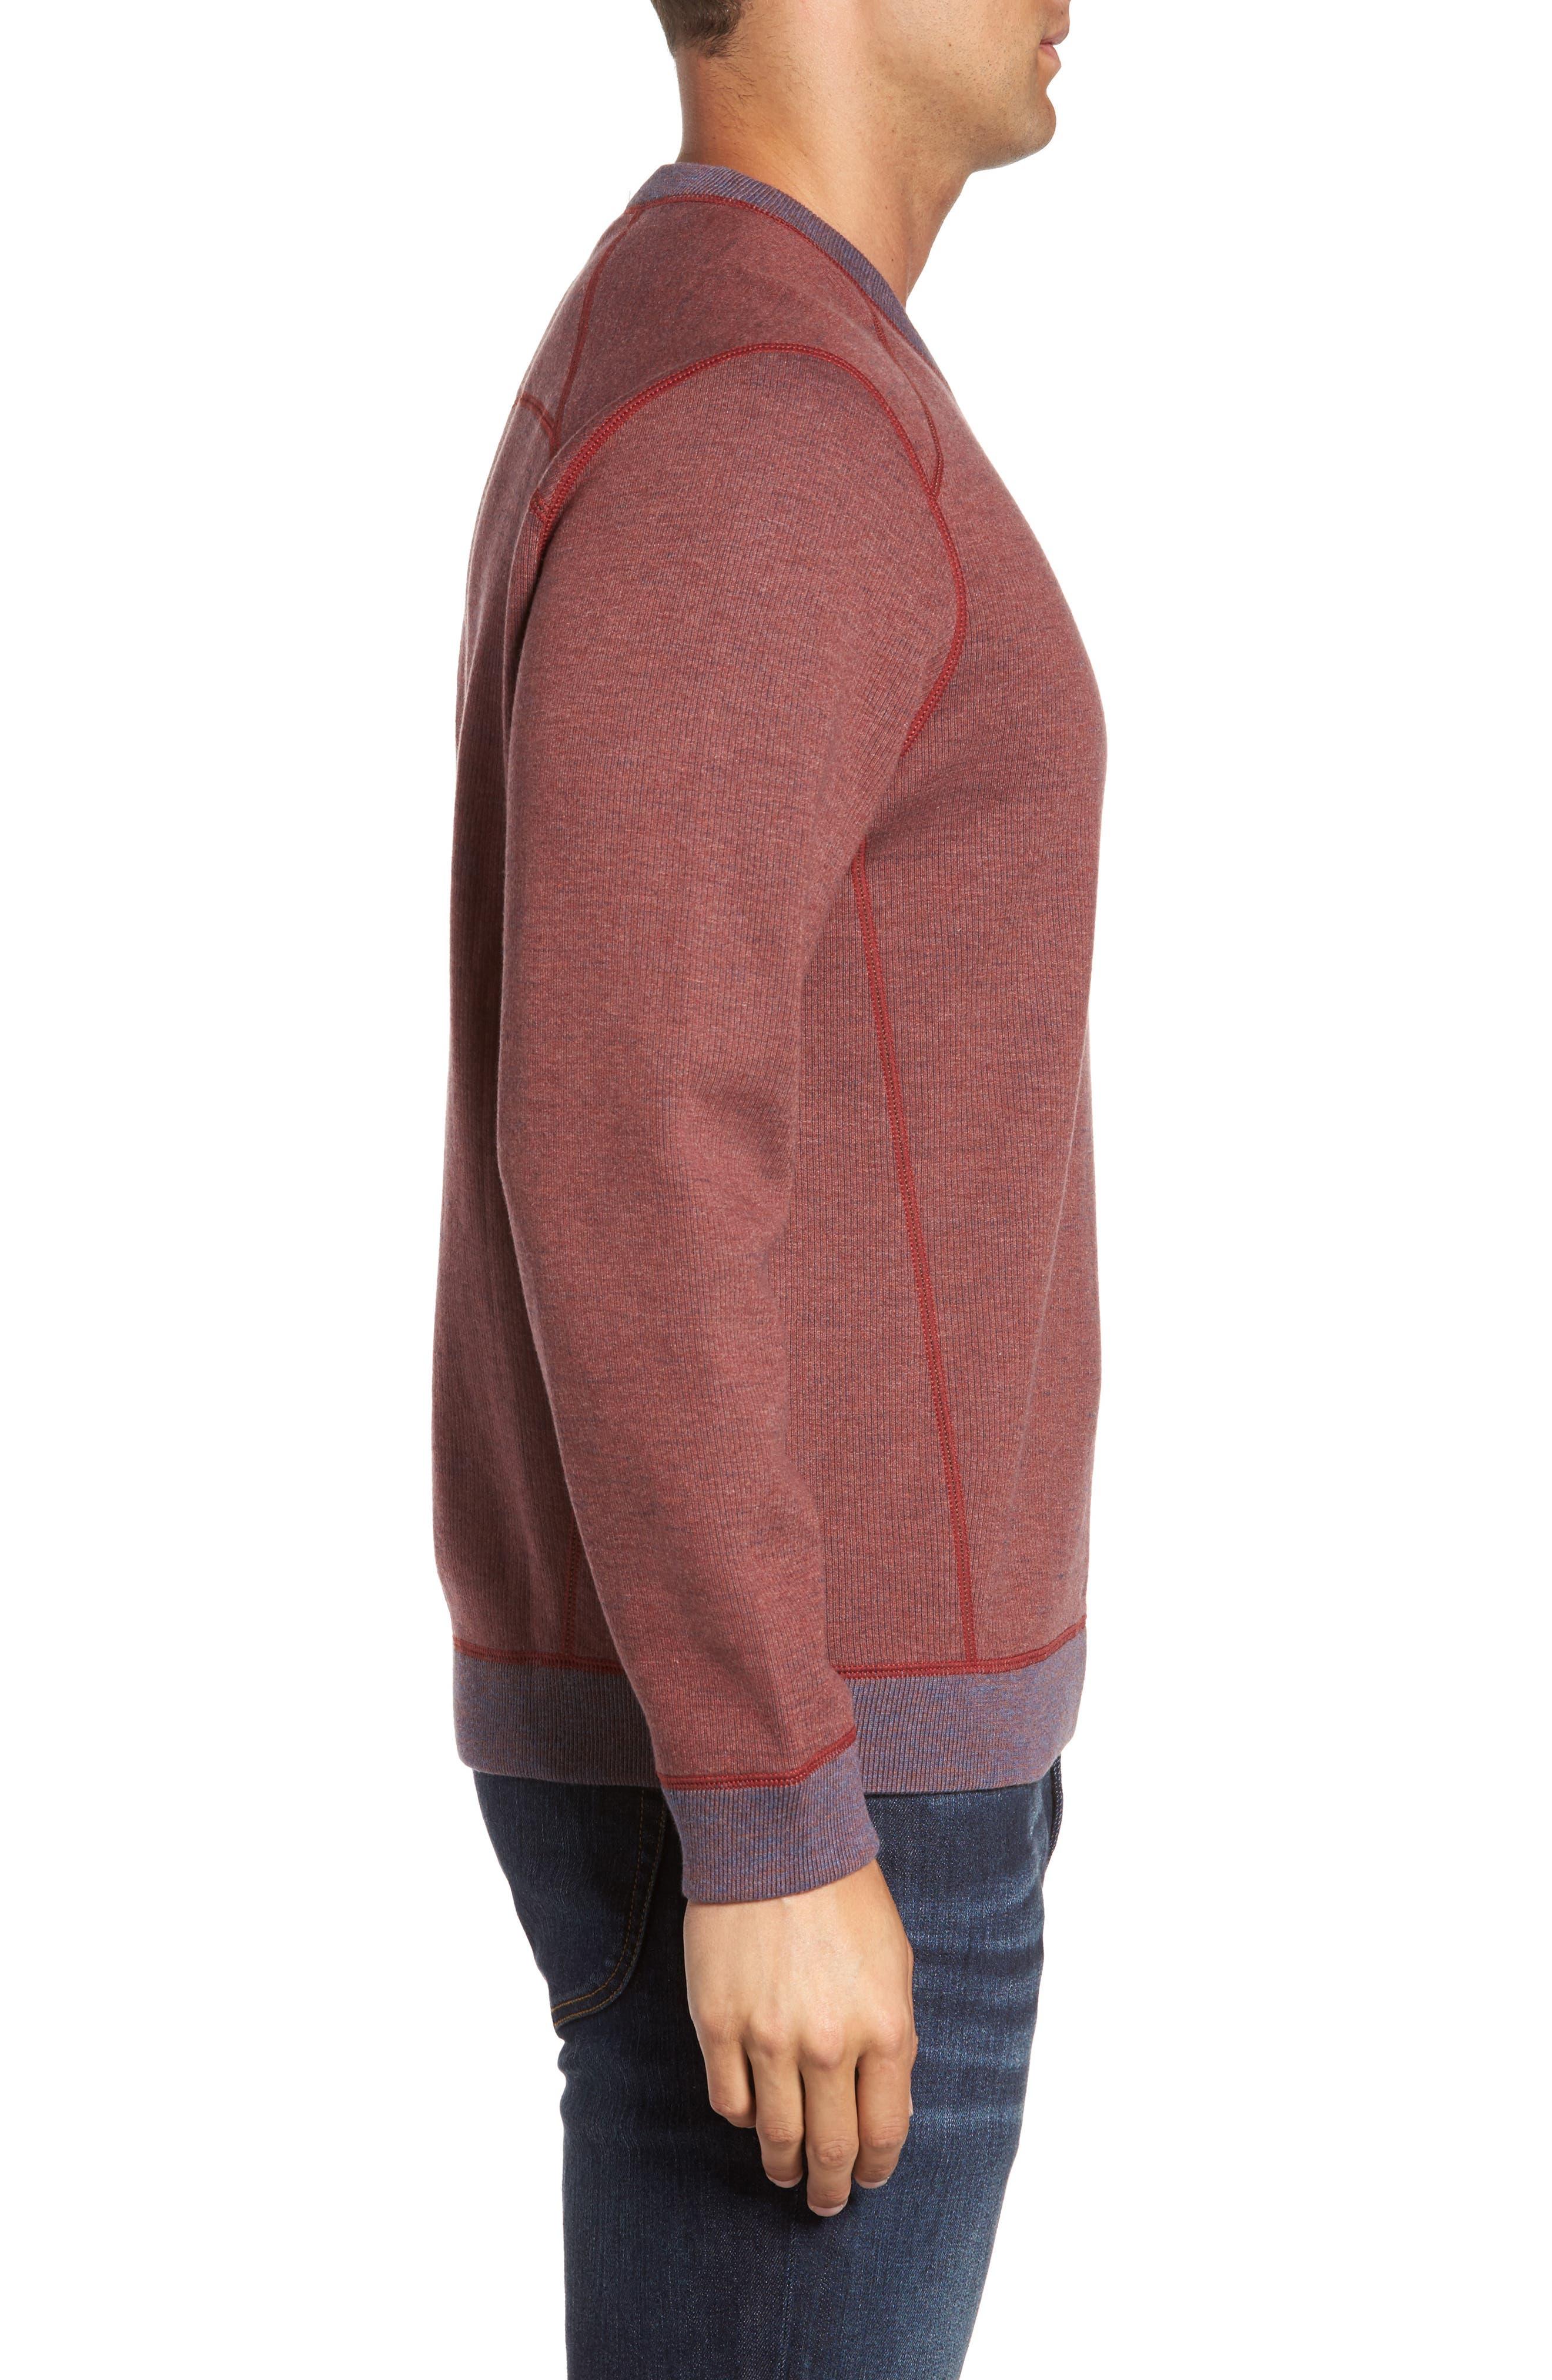 Flipside Pro Reversible Sweatshirt,                             Alternate thumbnail 3, color,                             Pompeya Heather